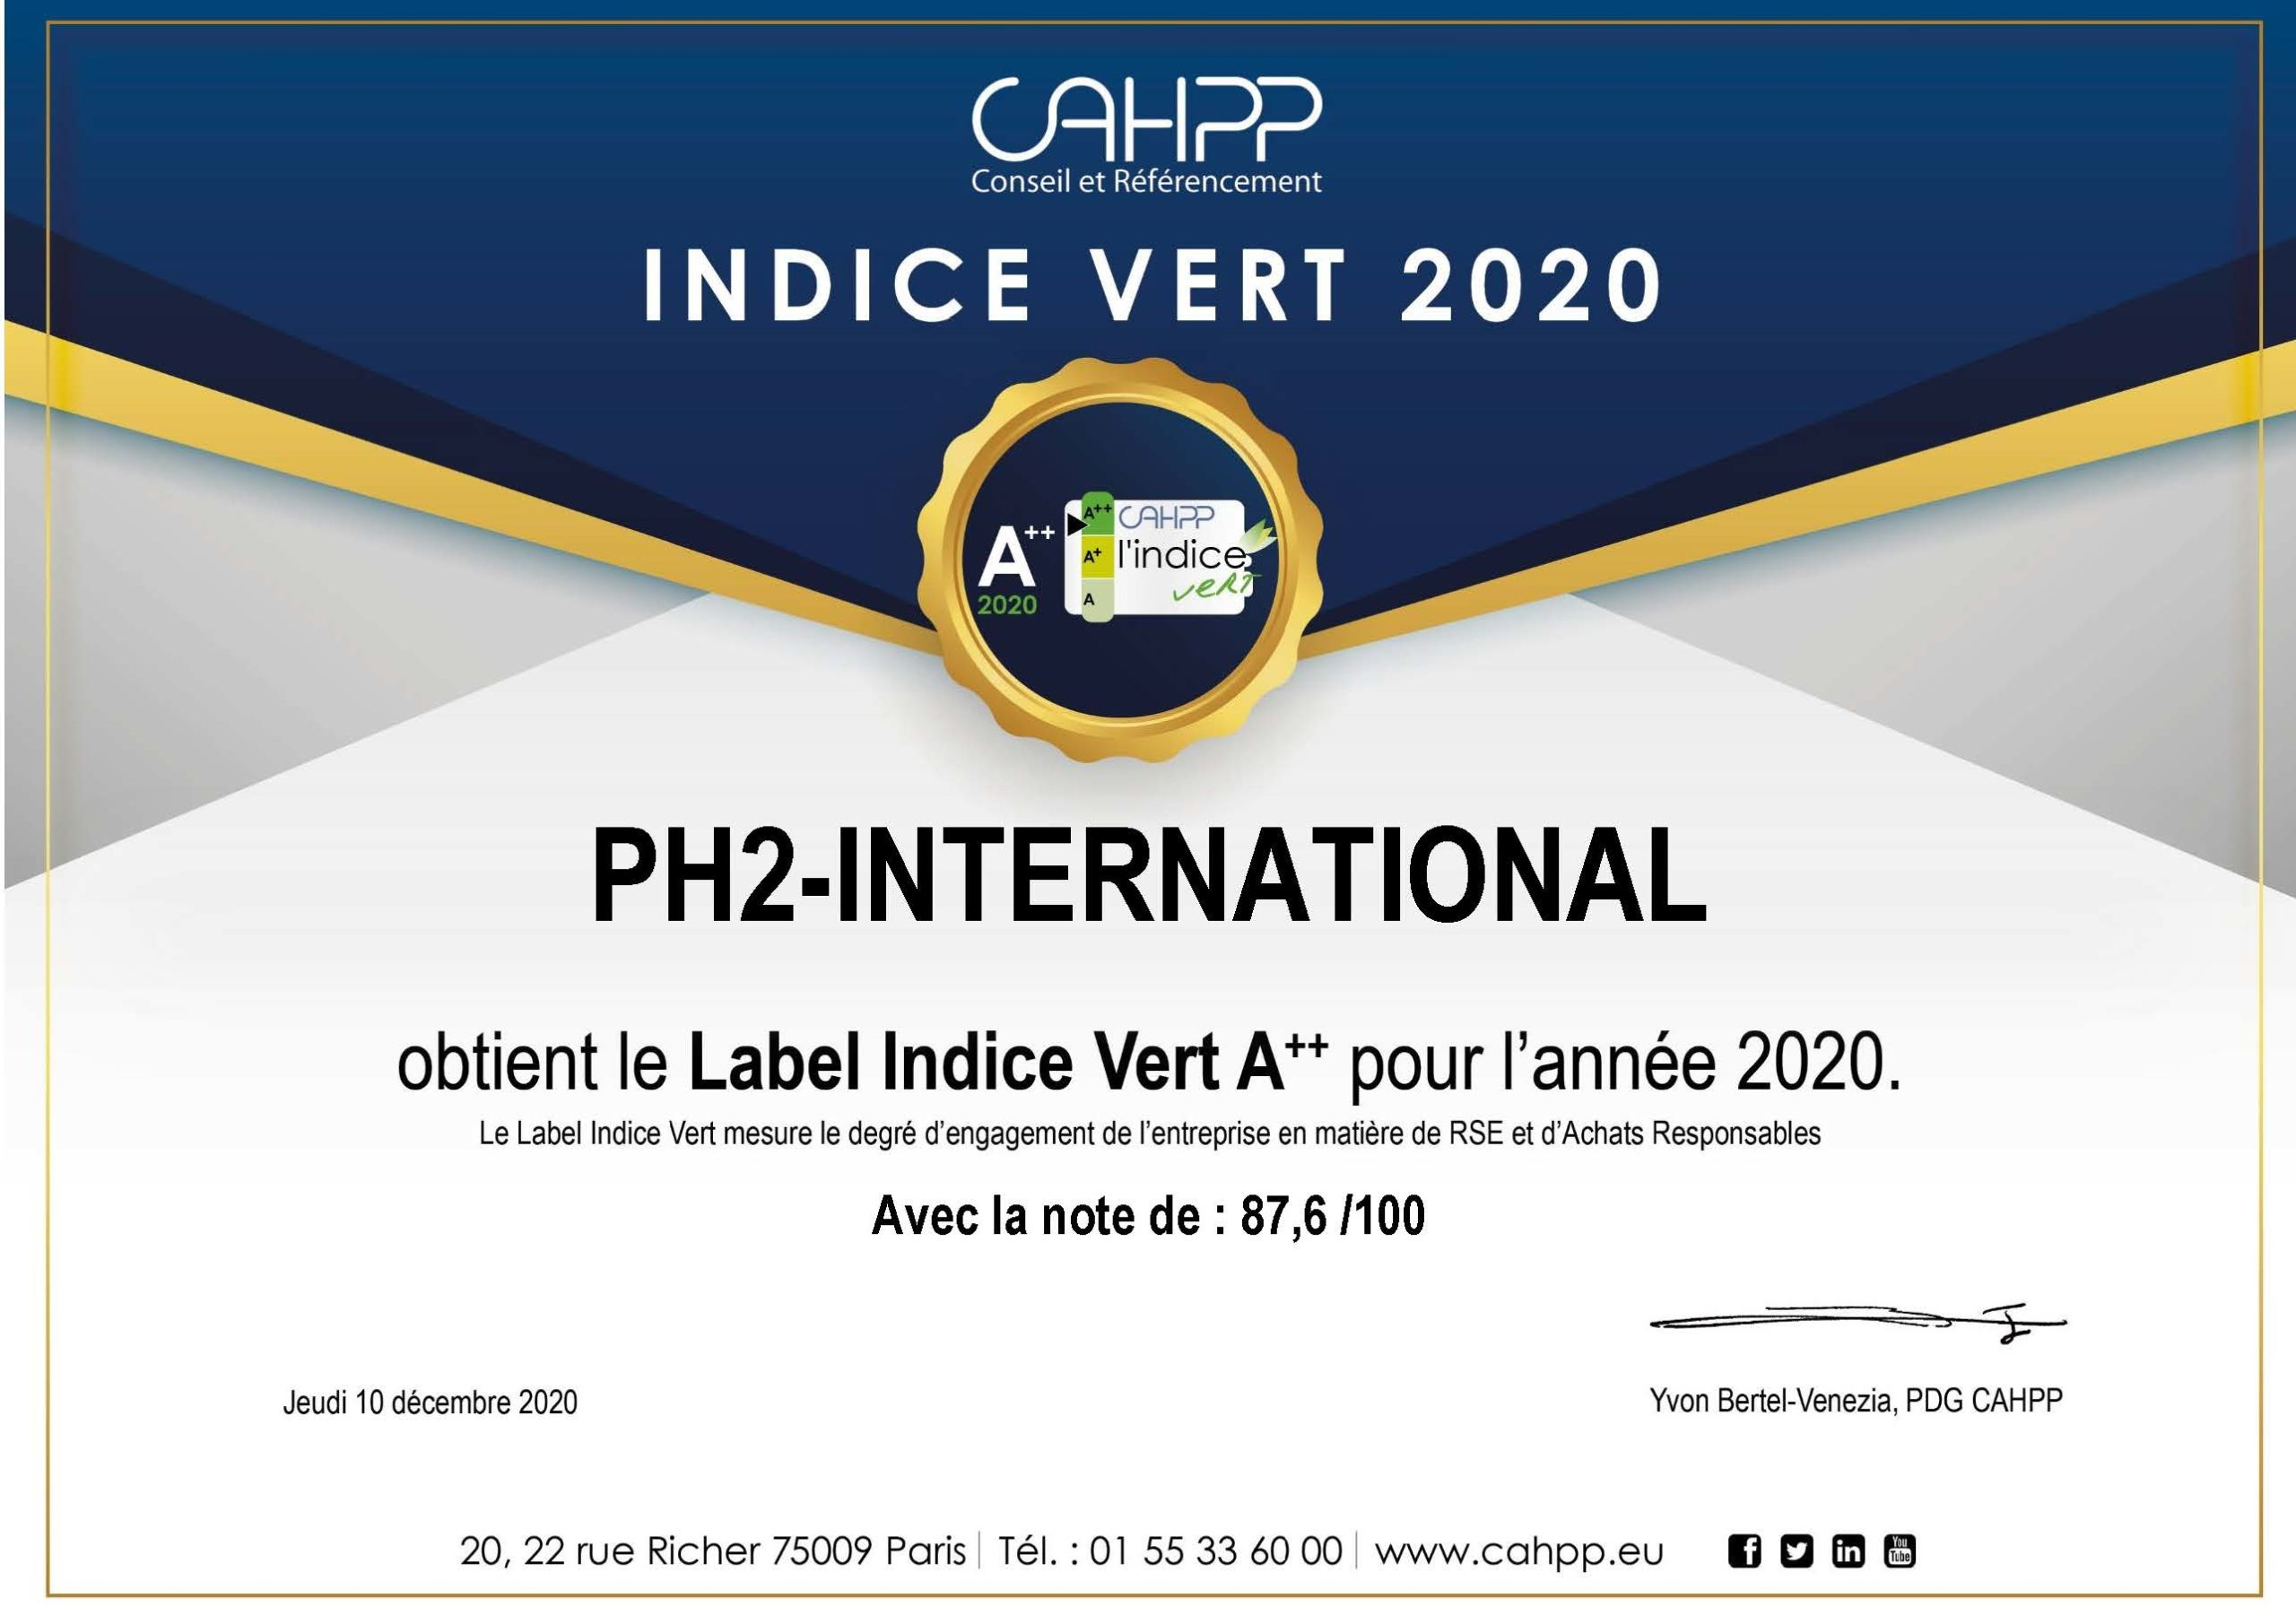 PH² International – Indice Vert CAHPP 2020